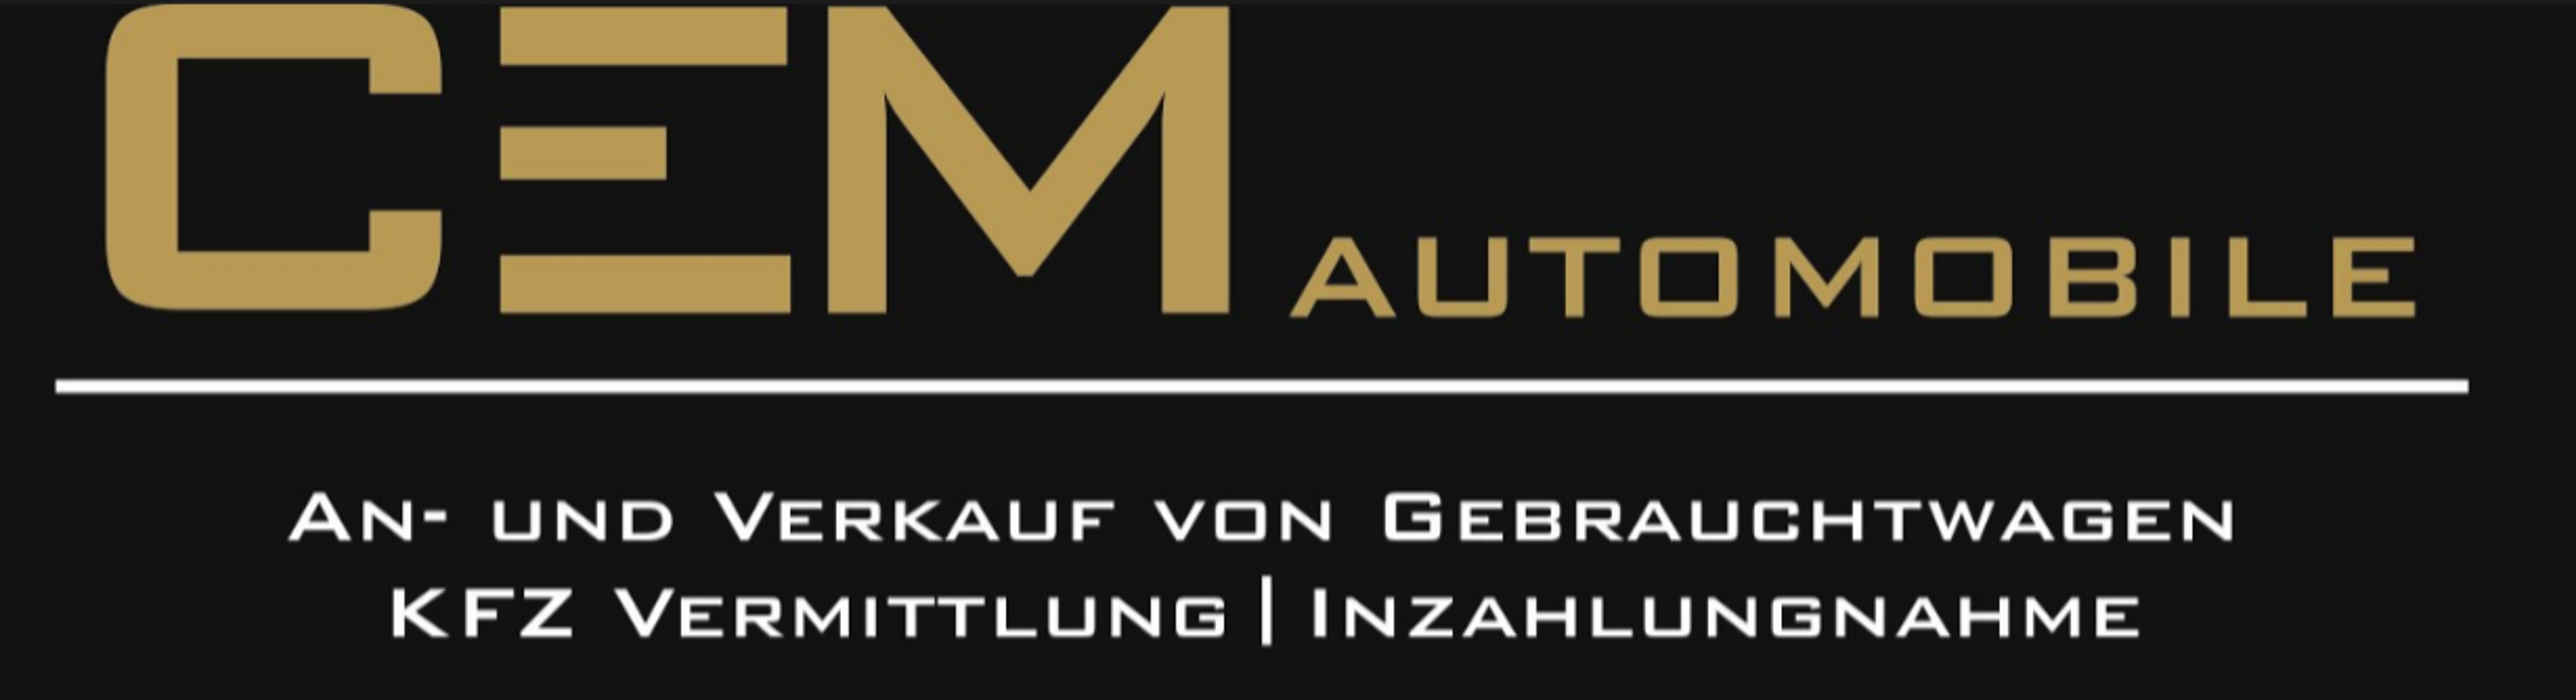 Logo von Cem Automobile